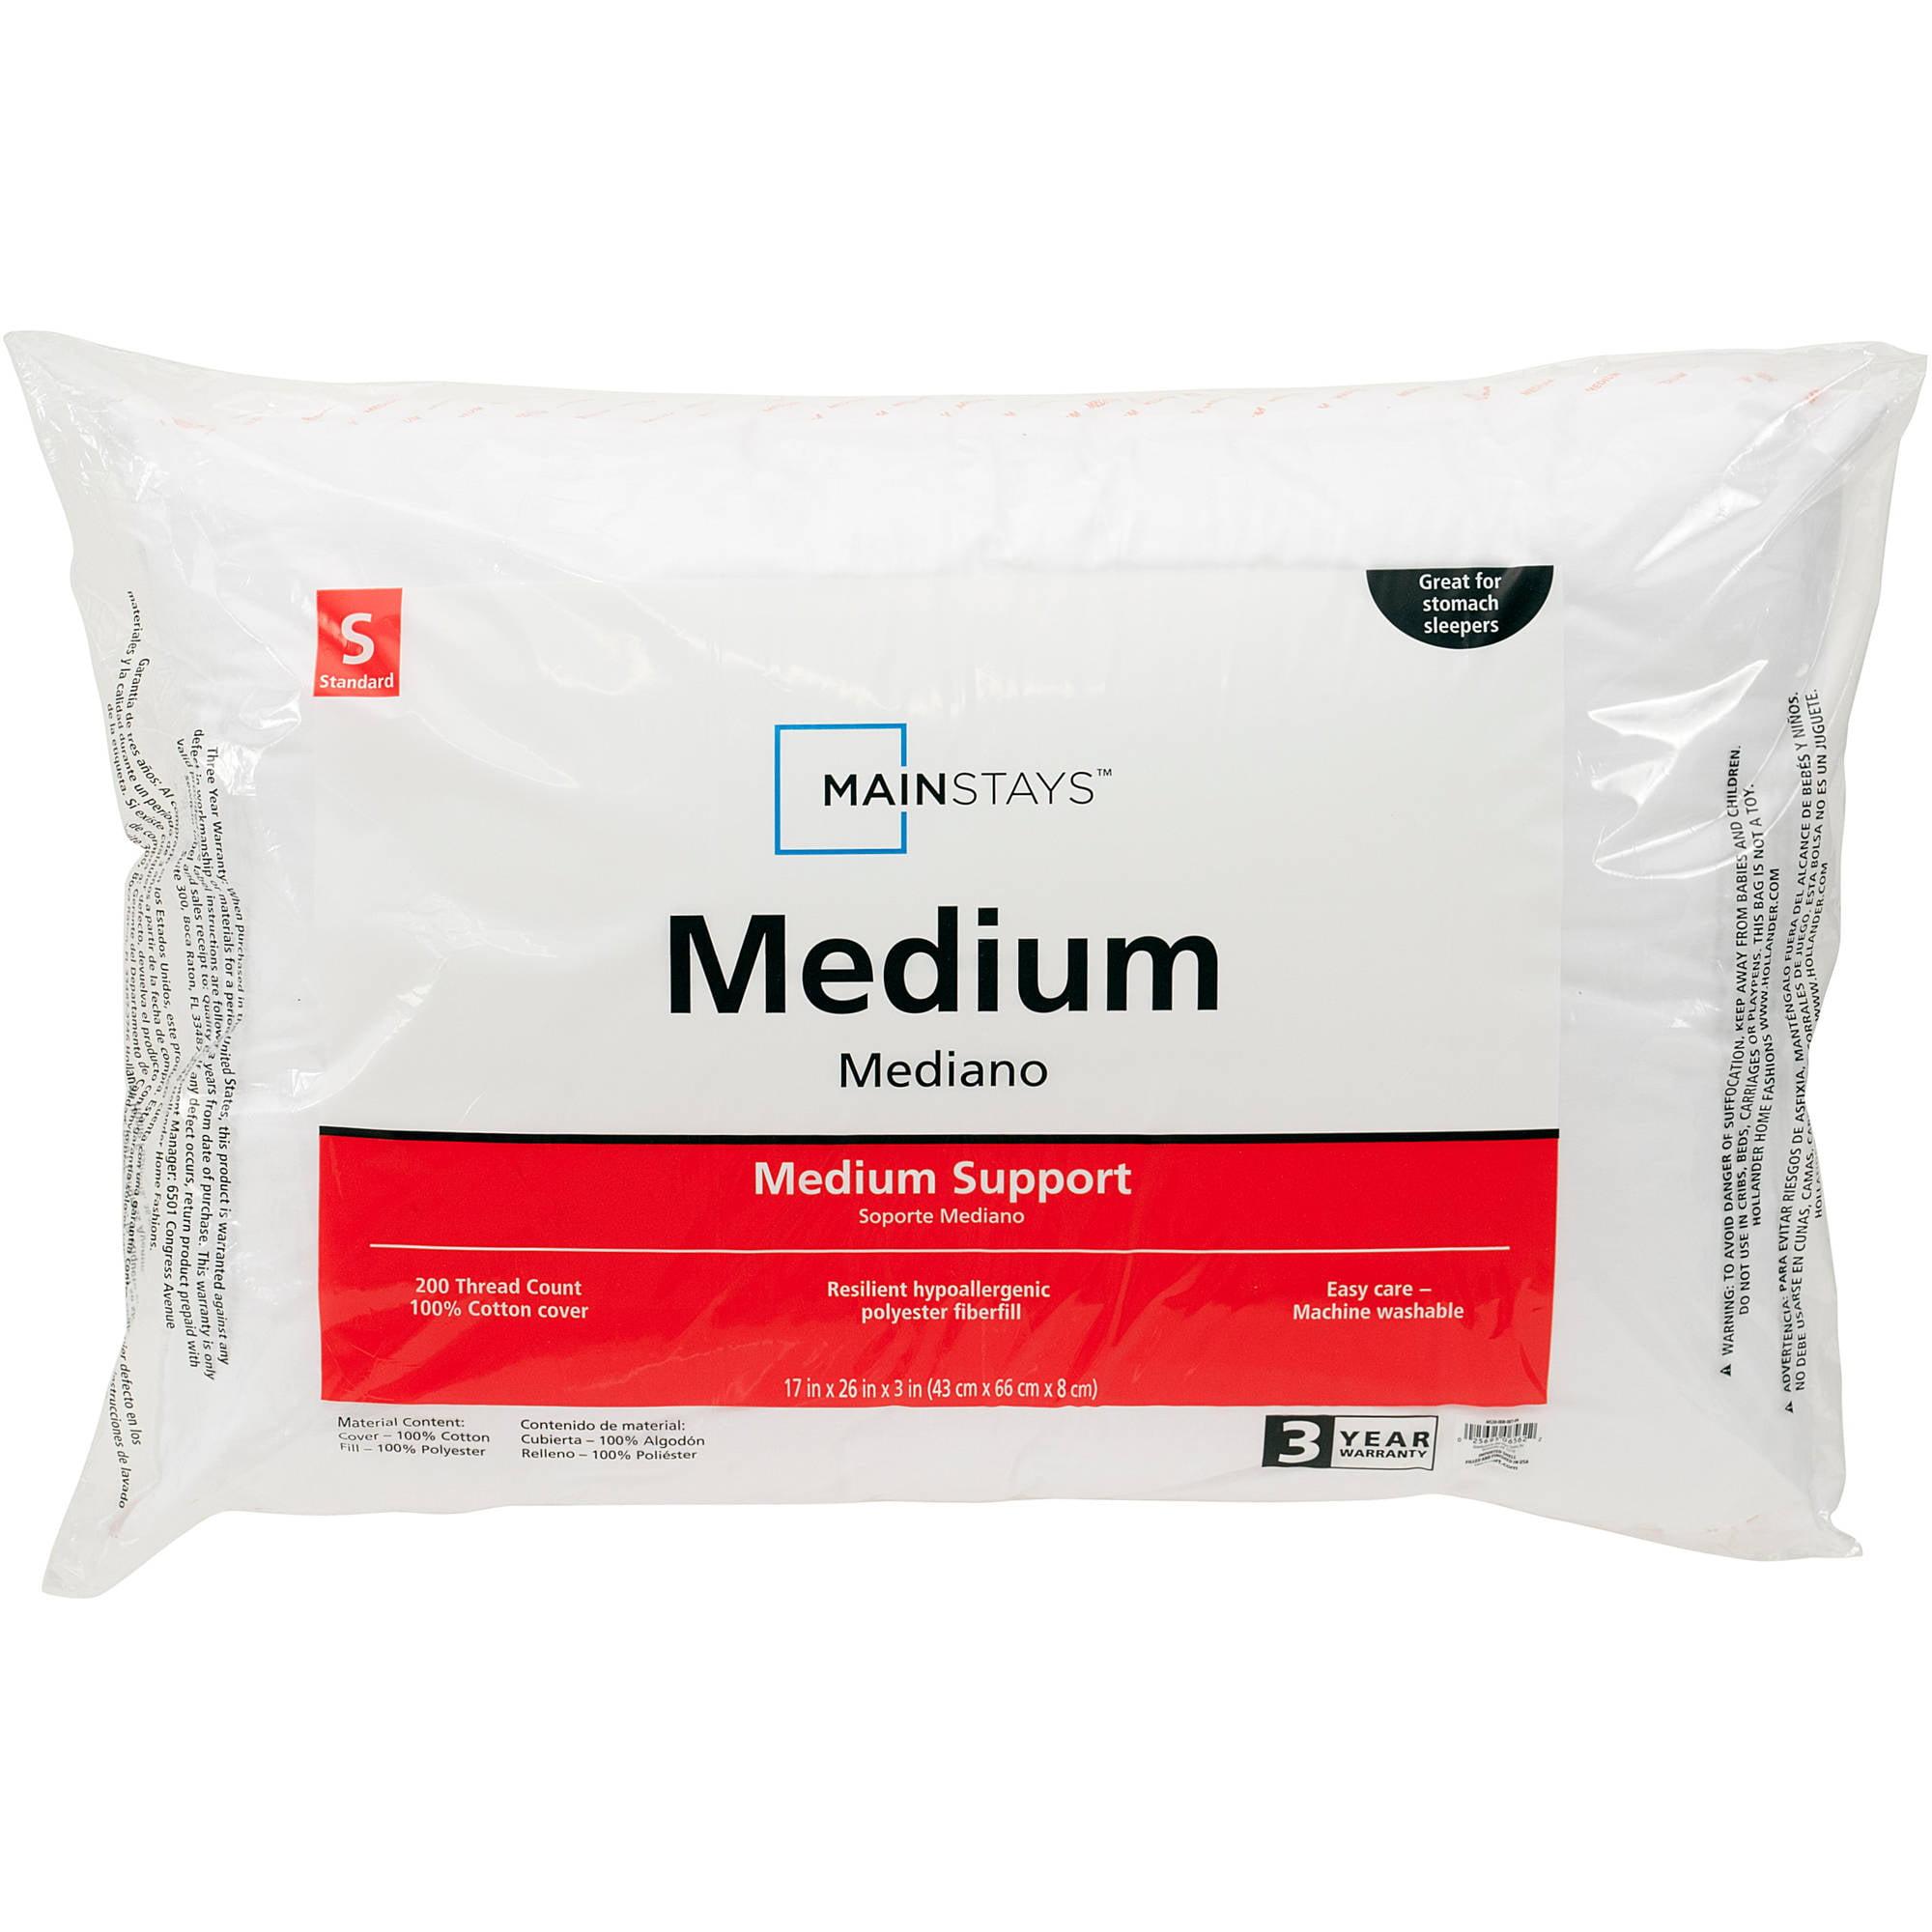 Mainstays 100% Cotton Medium Pillows, Set of 2, Multiple Sizes